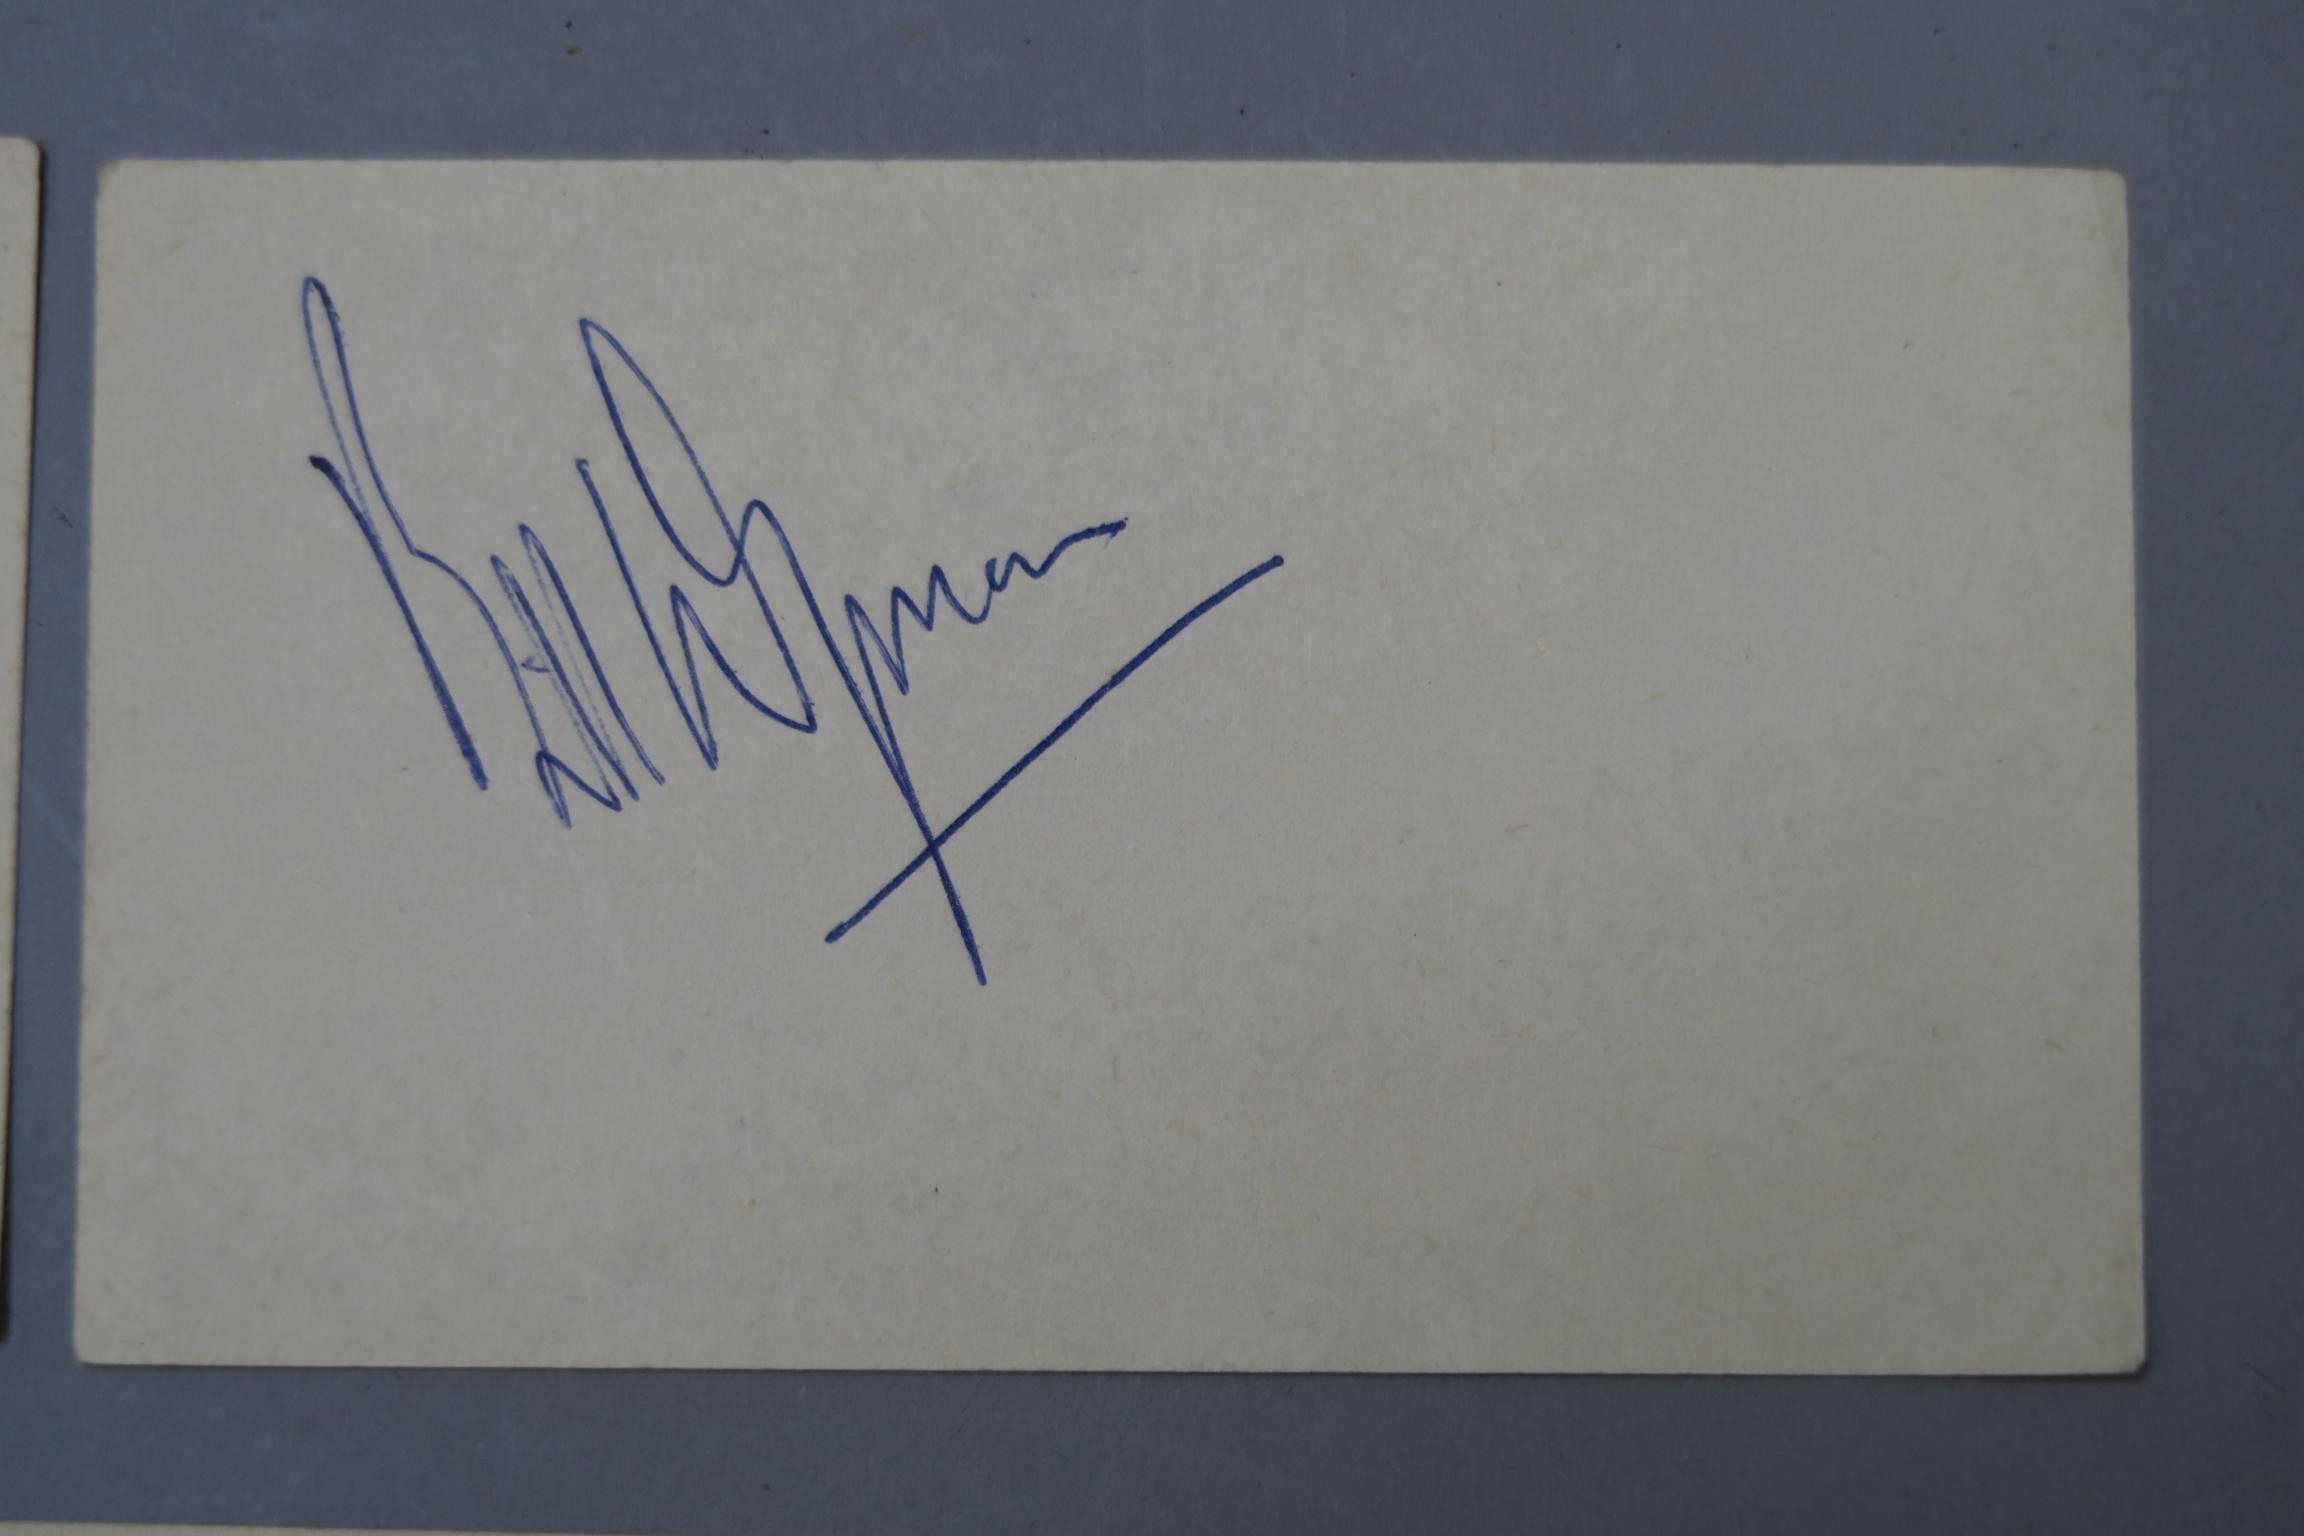 Lot 17 - The Rolling Stones five autographs Mick Jagger, Brian Jones, Bill Wyman,